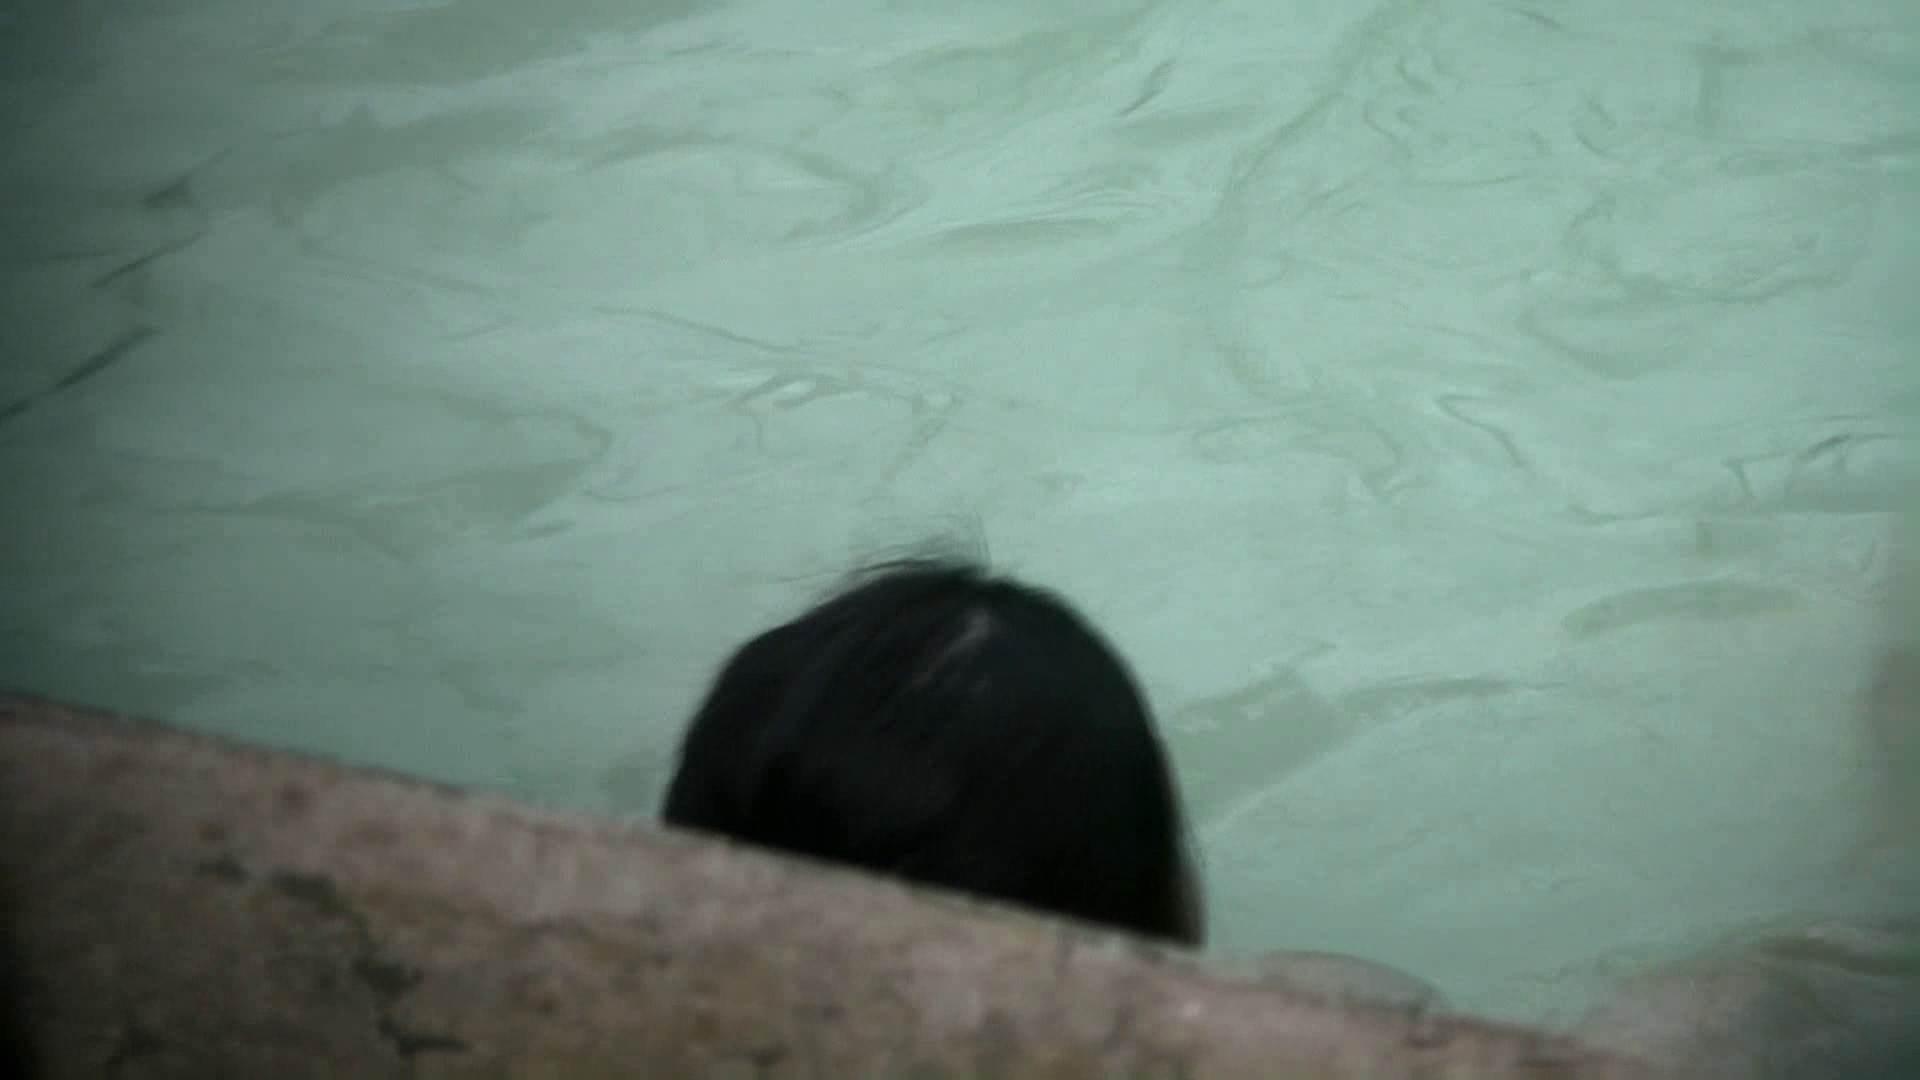 Aquaな露天風呂Vol.656 露天   HなOL  71pic 18